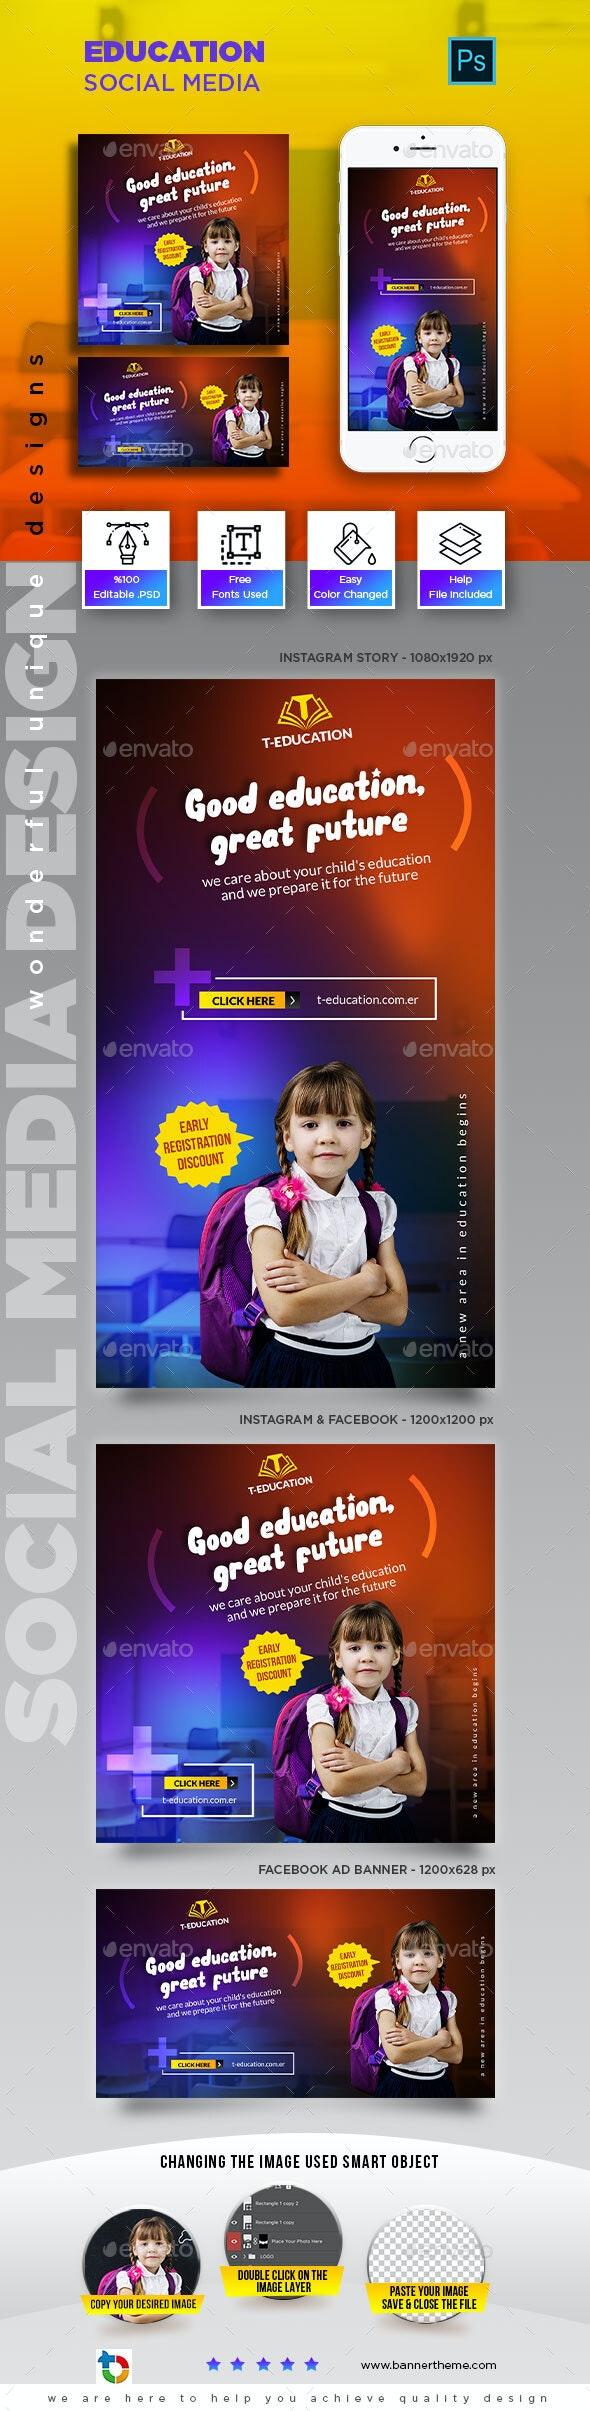 Education Social Media Banner - Social Media Web Elements